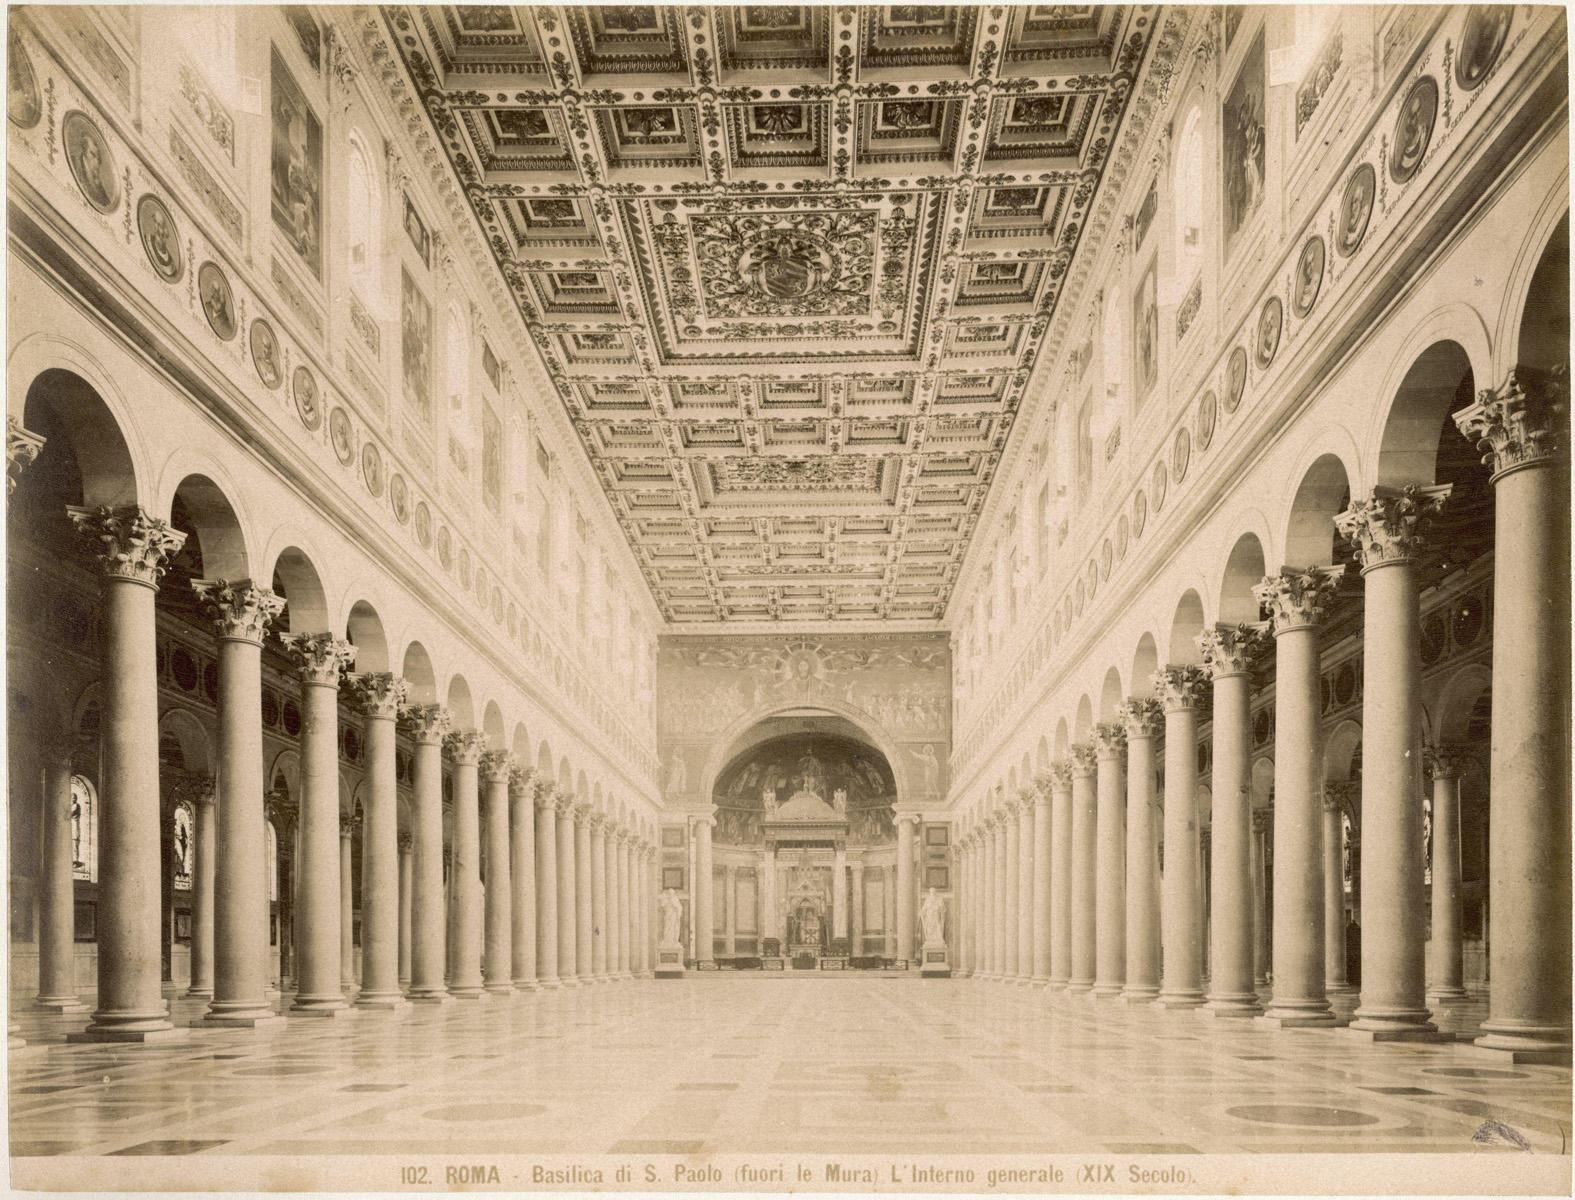 Rome basiliek st paulus buiten de muren san paolo fuori le mura interieur itali eind 19e for Interieur 19e eeuw